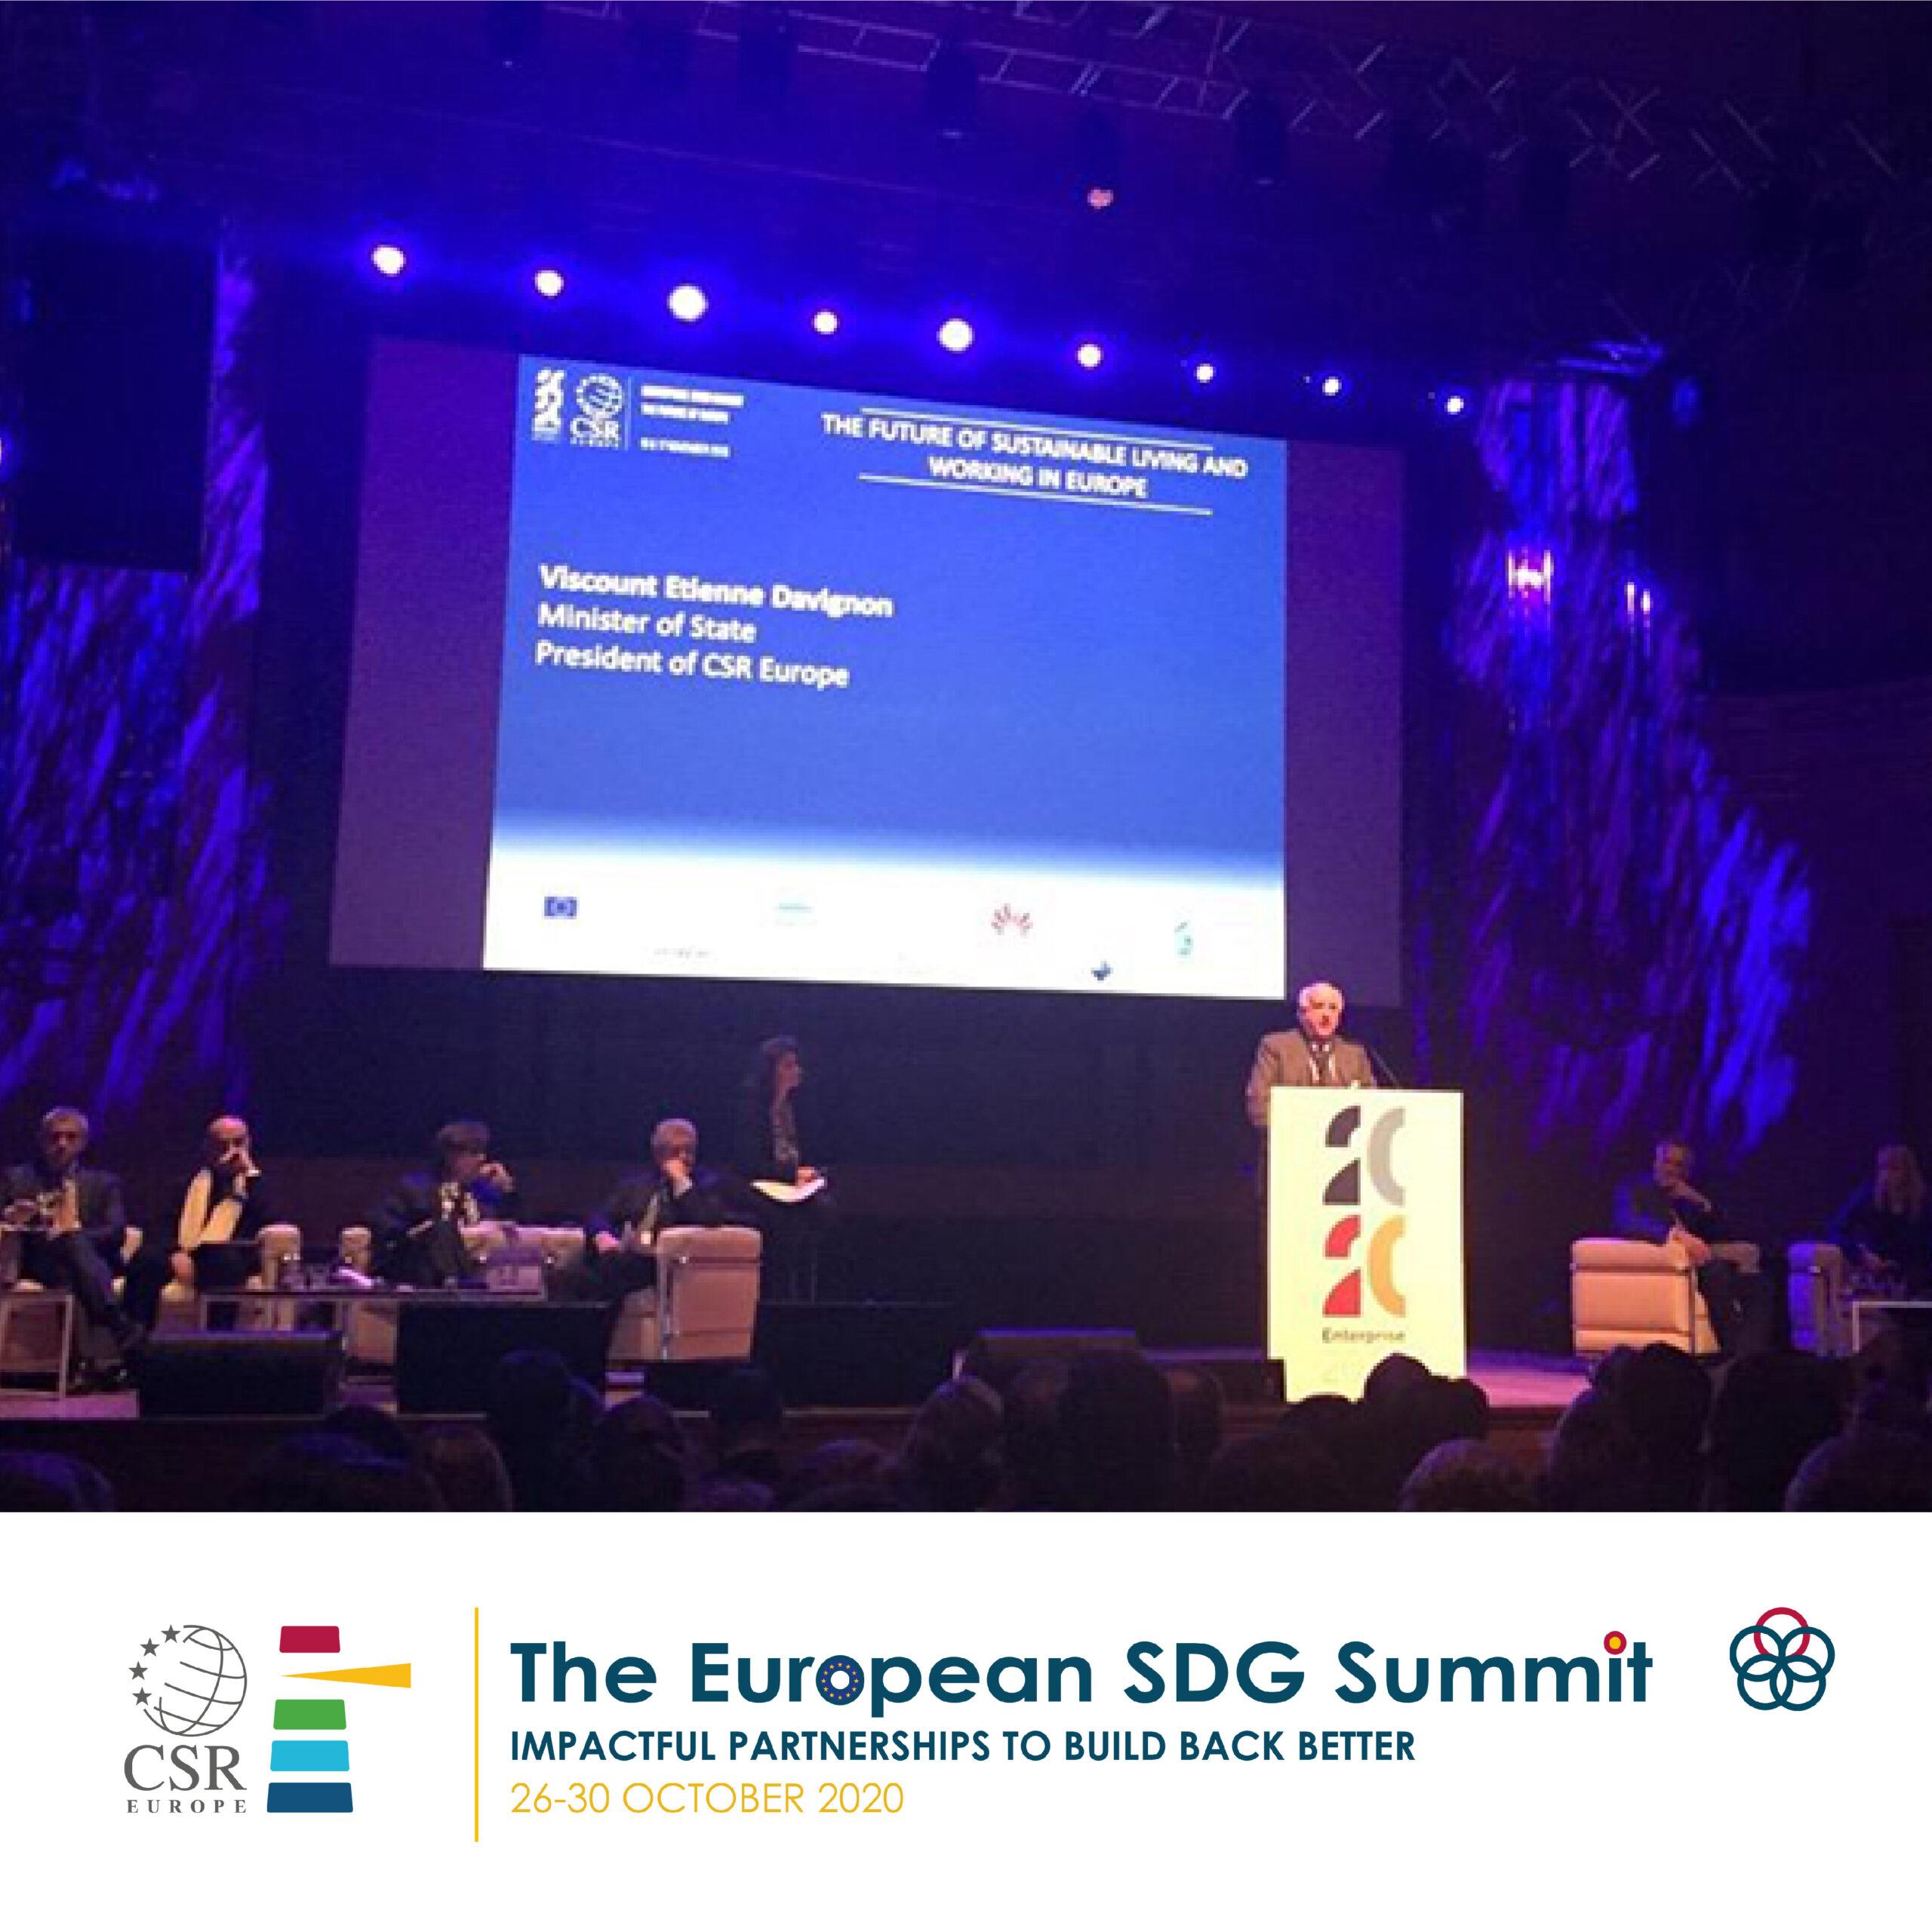 CSR Europe.